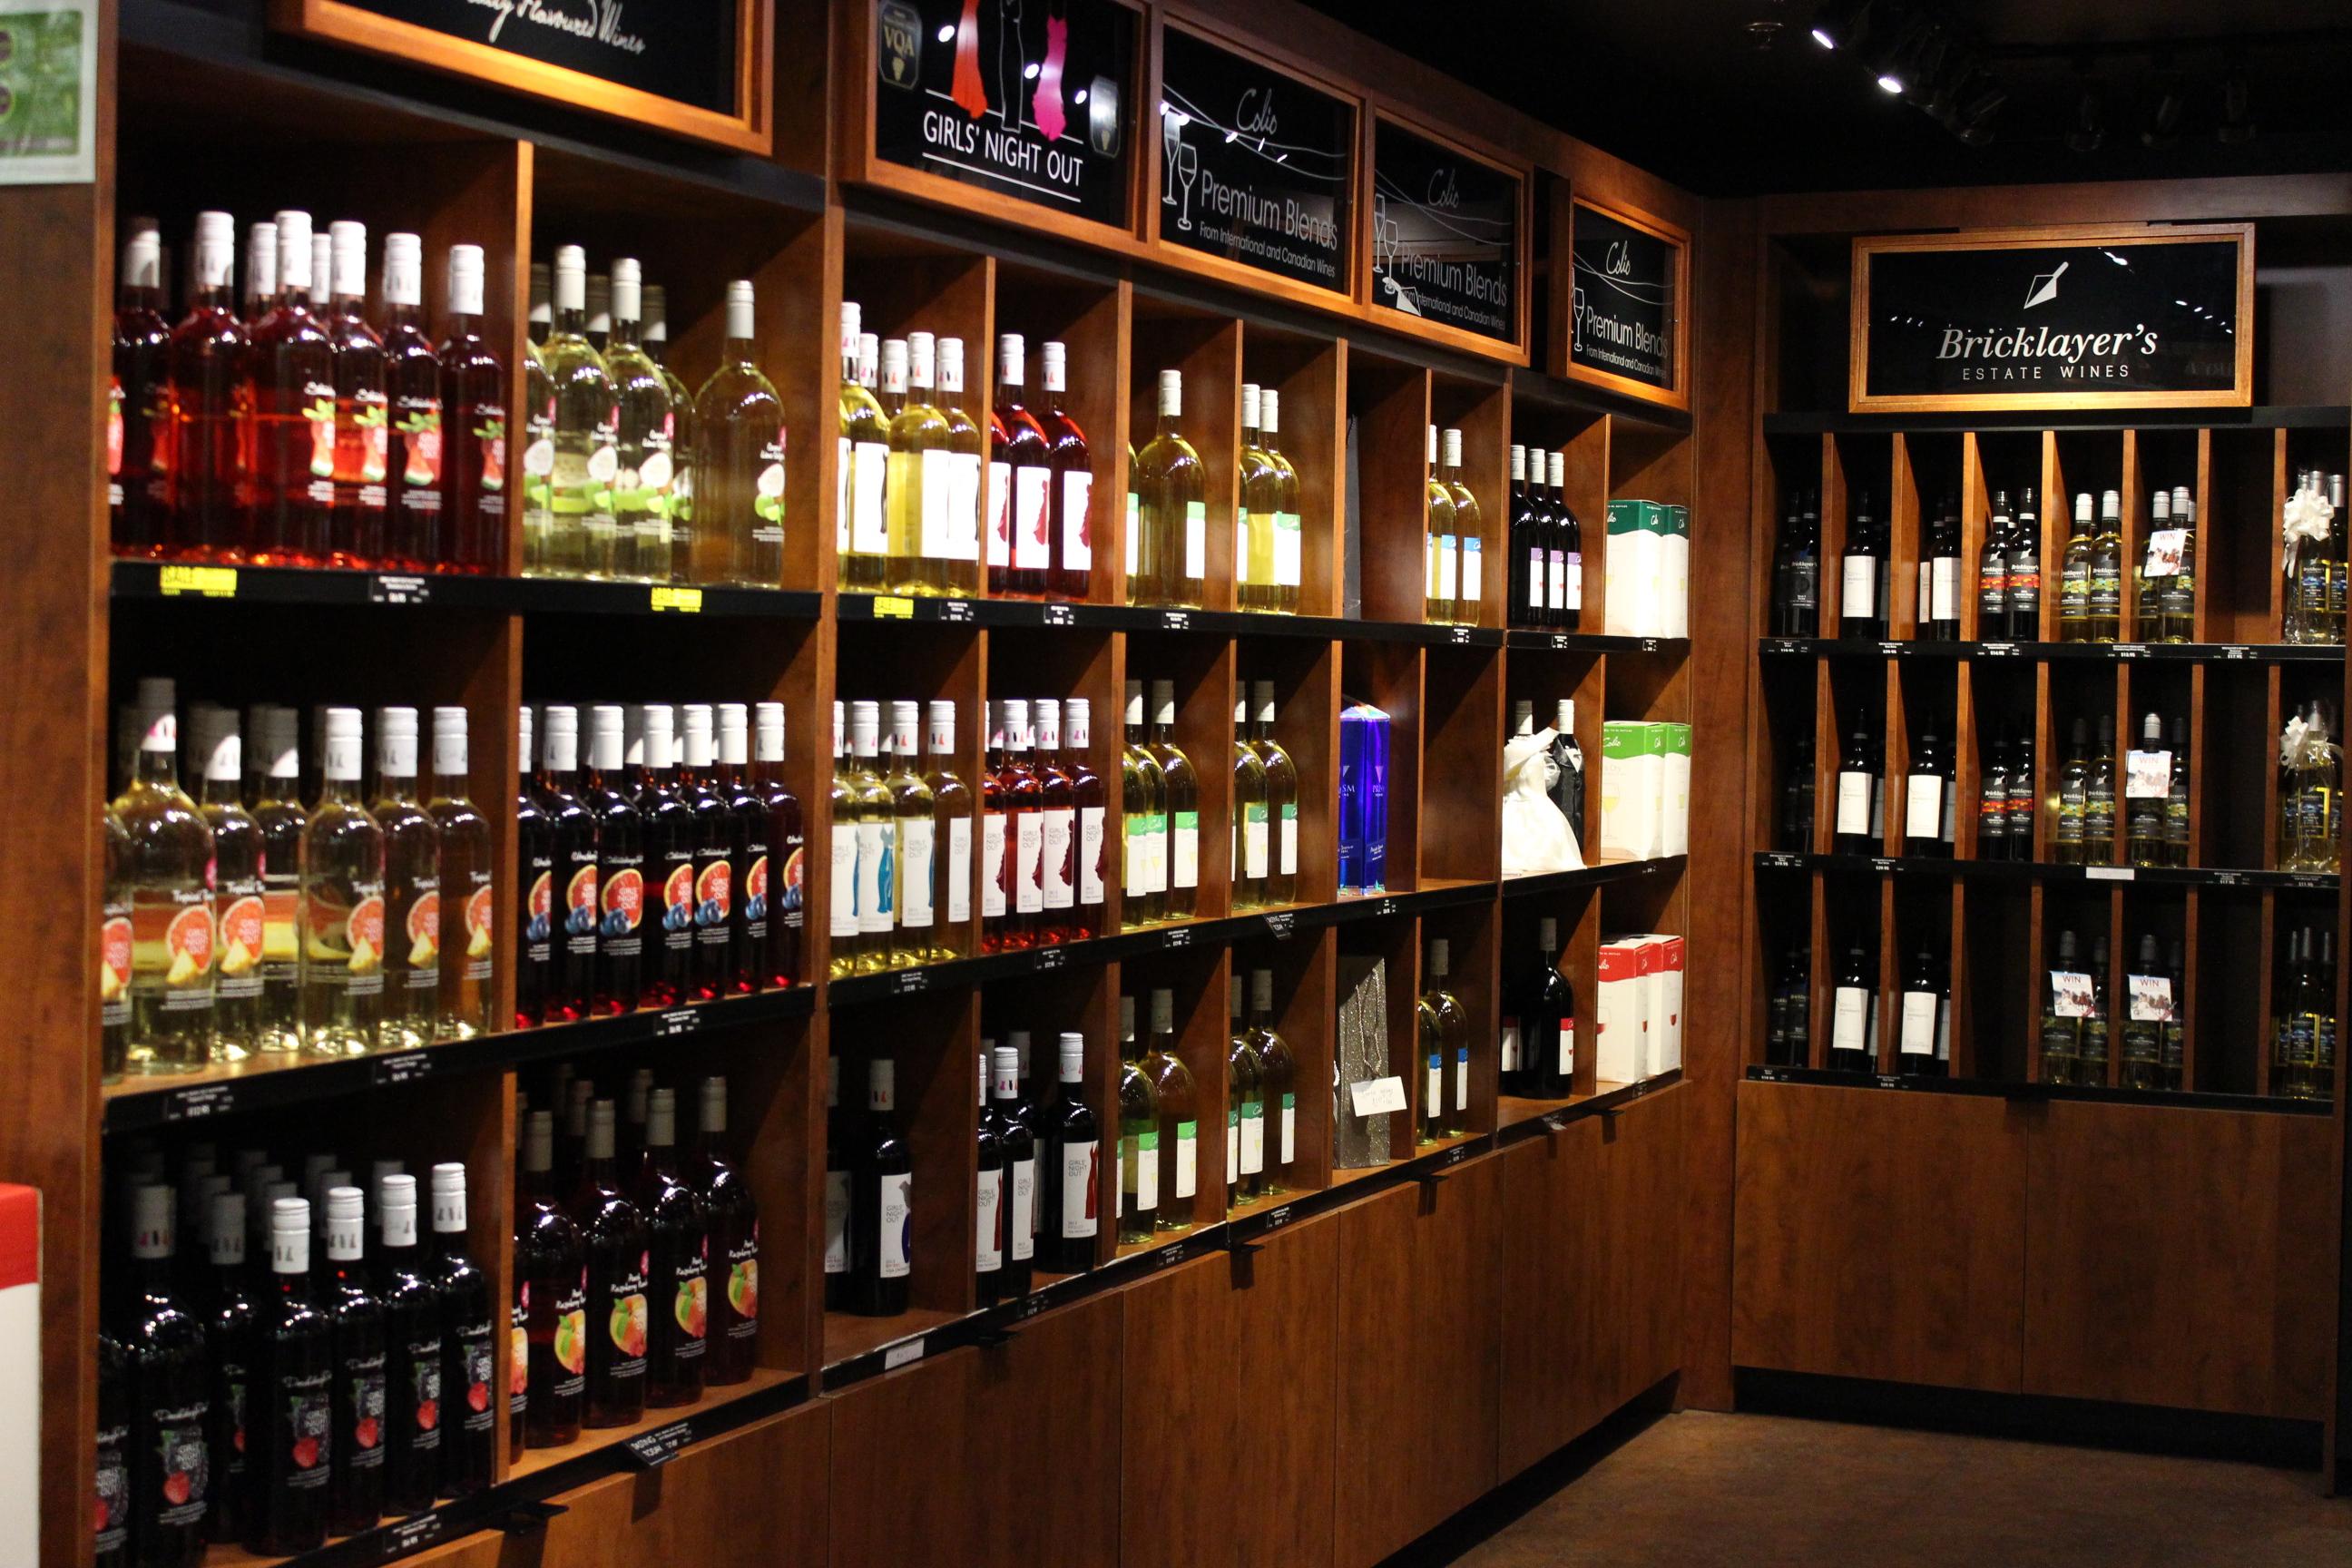 Colio wine selection